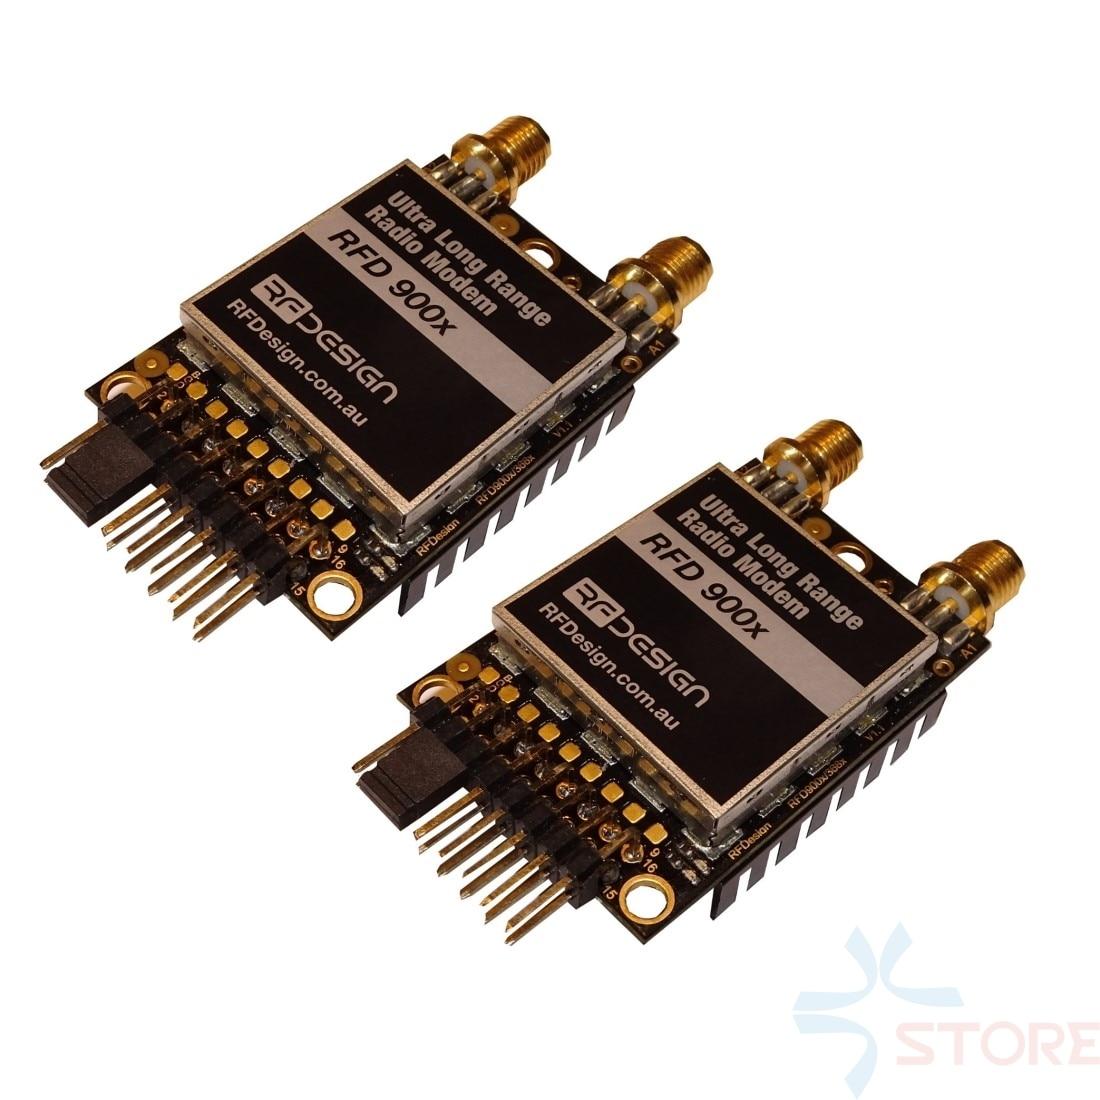 Over 40km RFD900X PLUS 915MHz Ultra Long Range Telemetry Radio Modem with Diversity FTDI & Antenna for APM PIX Flight Controller